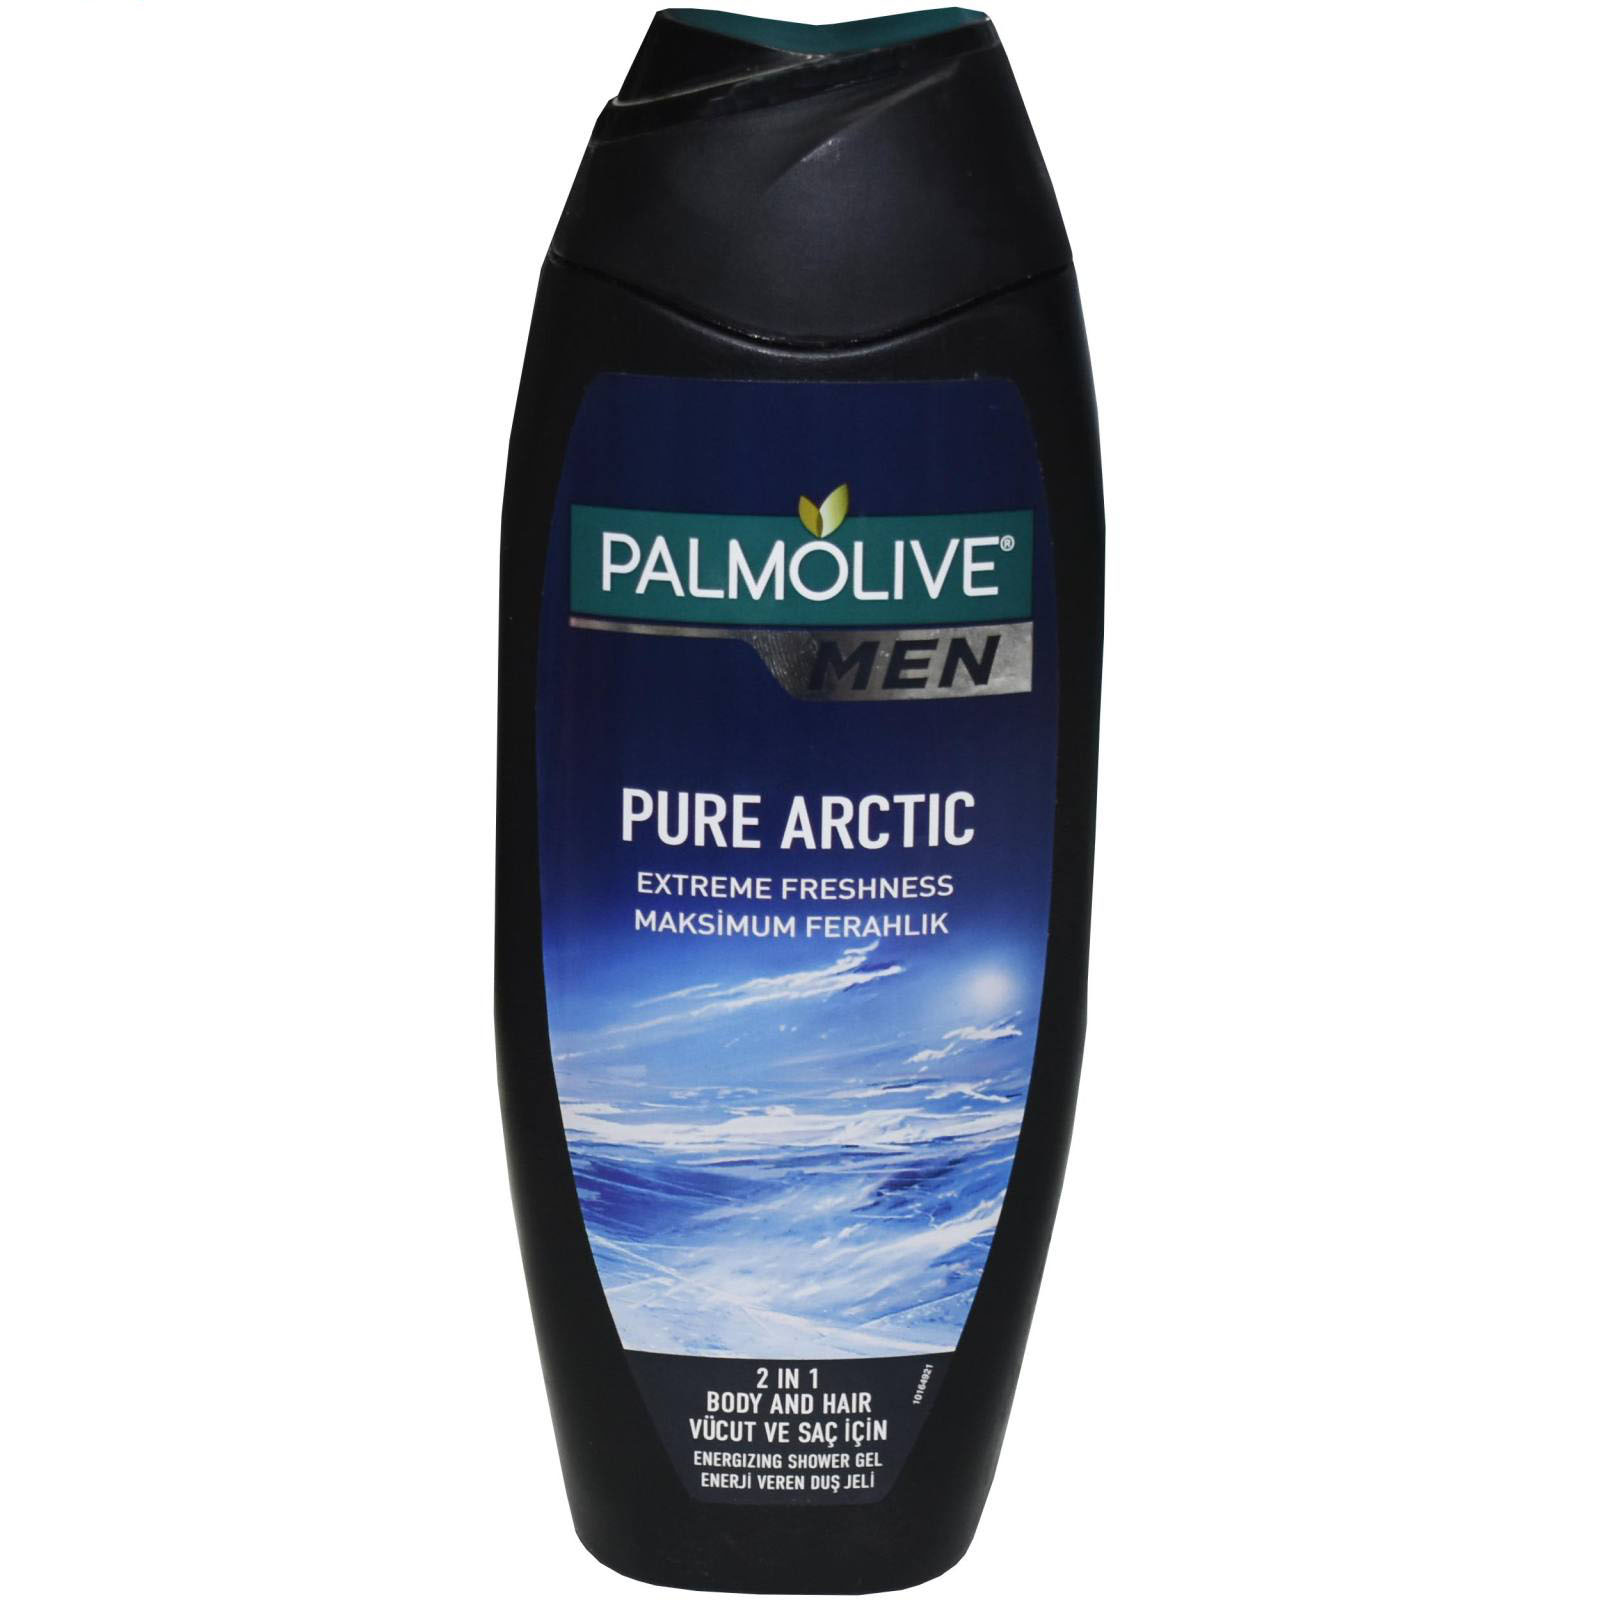 شامپو مو و بدن پالمولیو مدل PURE ARCTIC حجم ۵۰۰ میلی لیتر